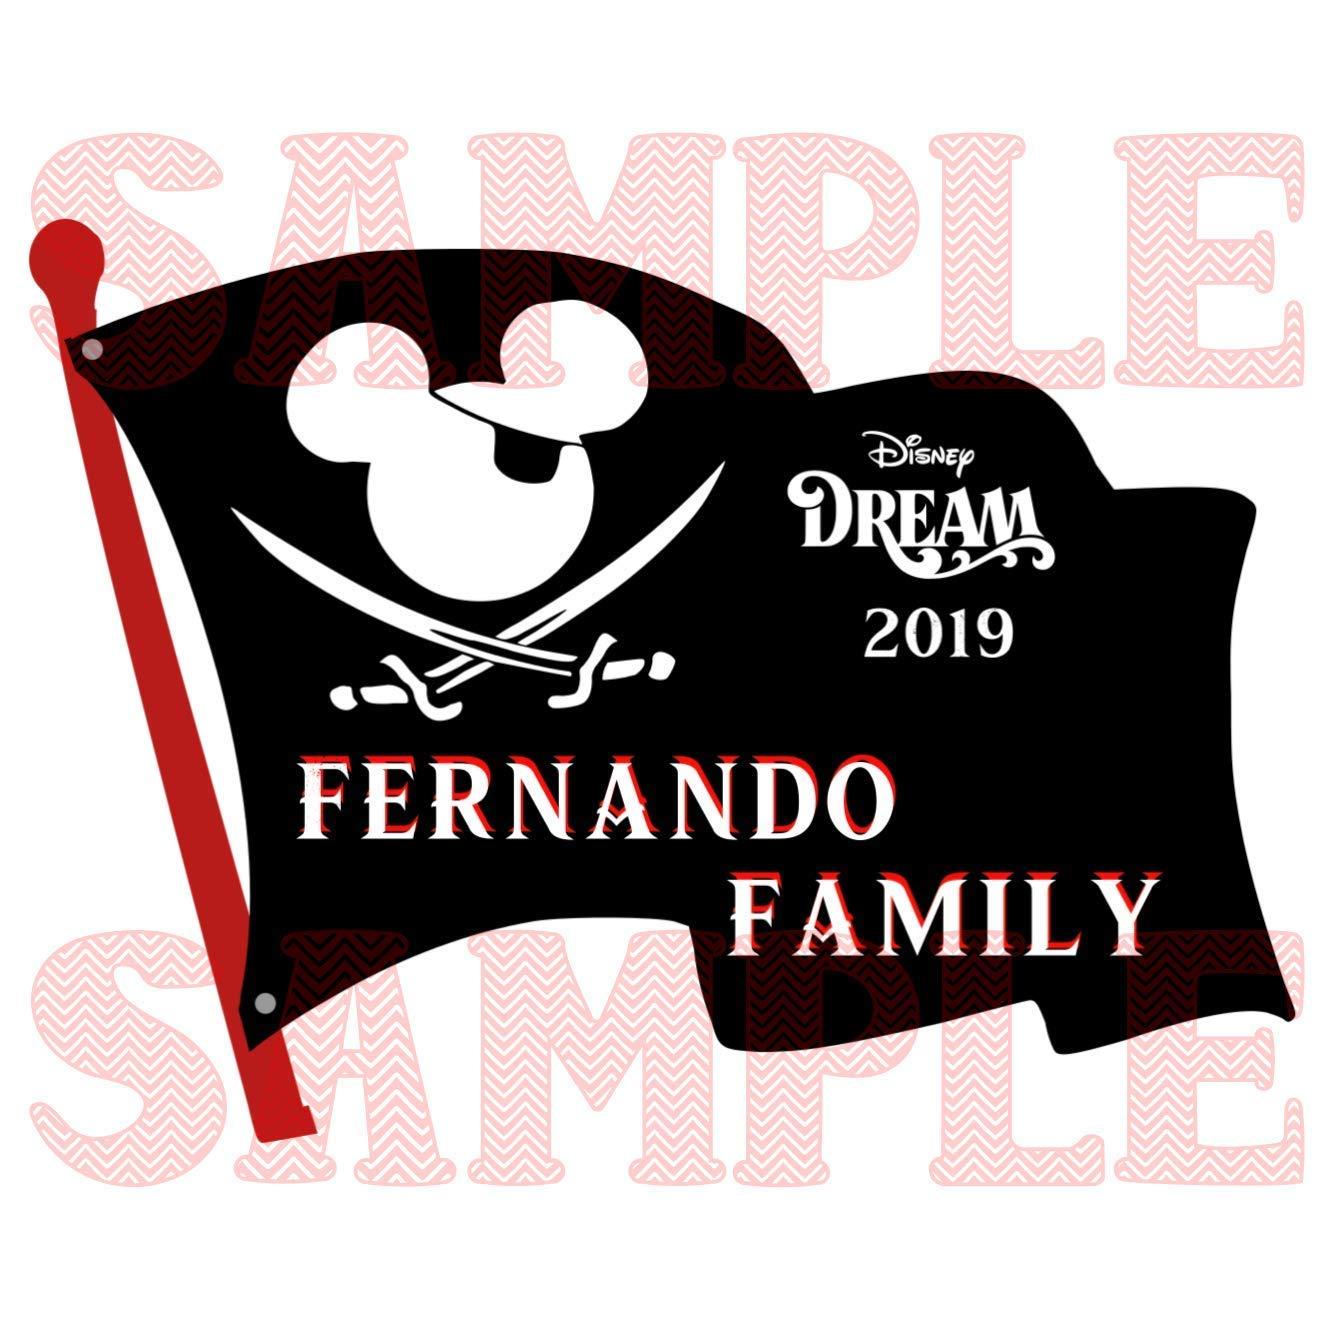 Large Disney Pirate Night Flag Magnets Family Name Disney Cruise Stateroom Magnet.